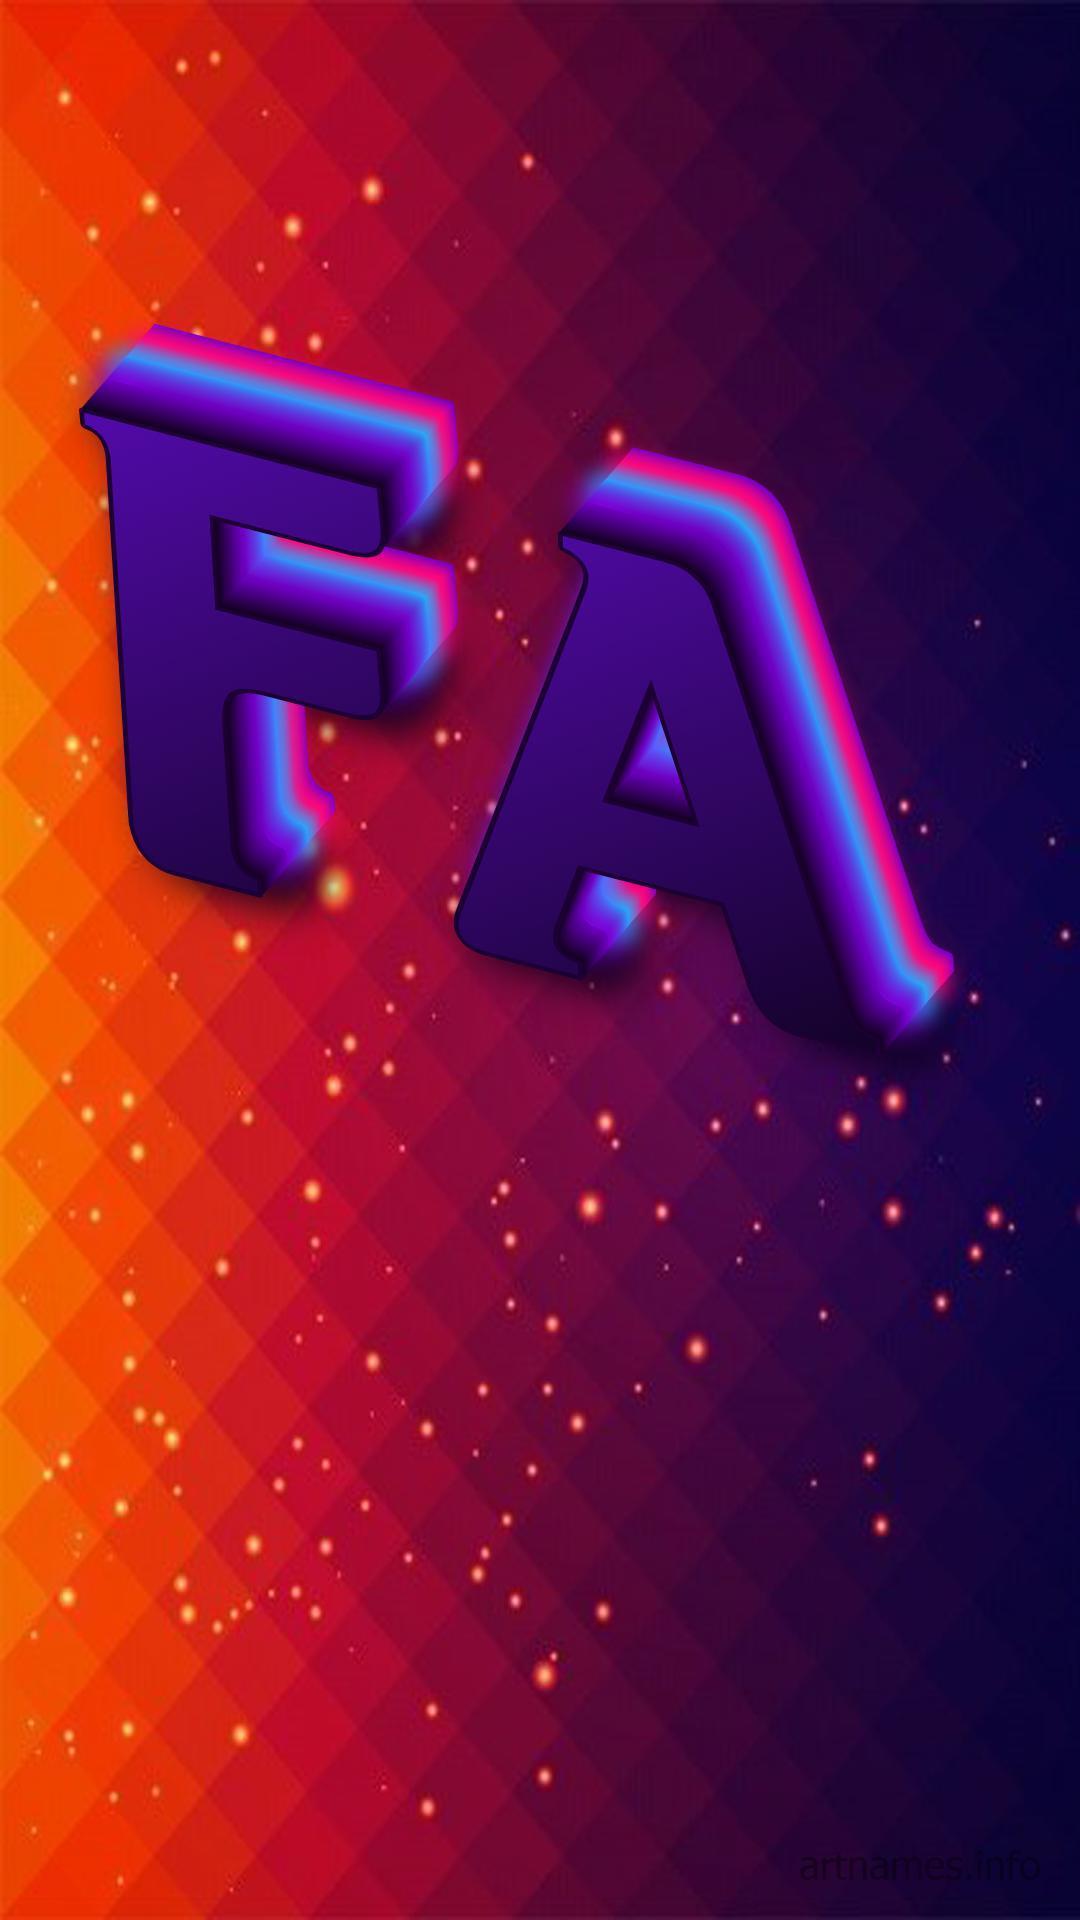 Fa as a ART Name Wallpaper ArtNames 1080x1920